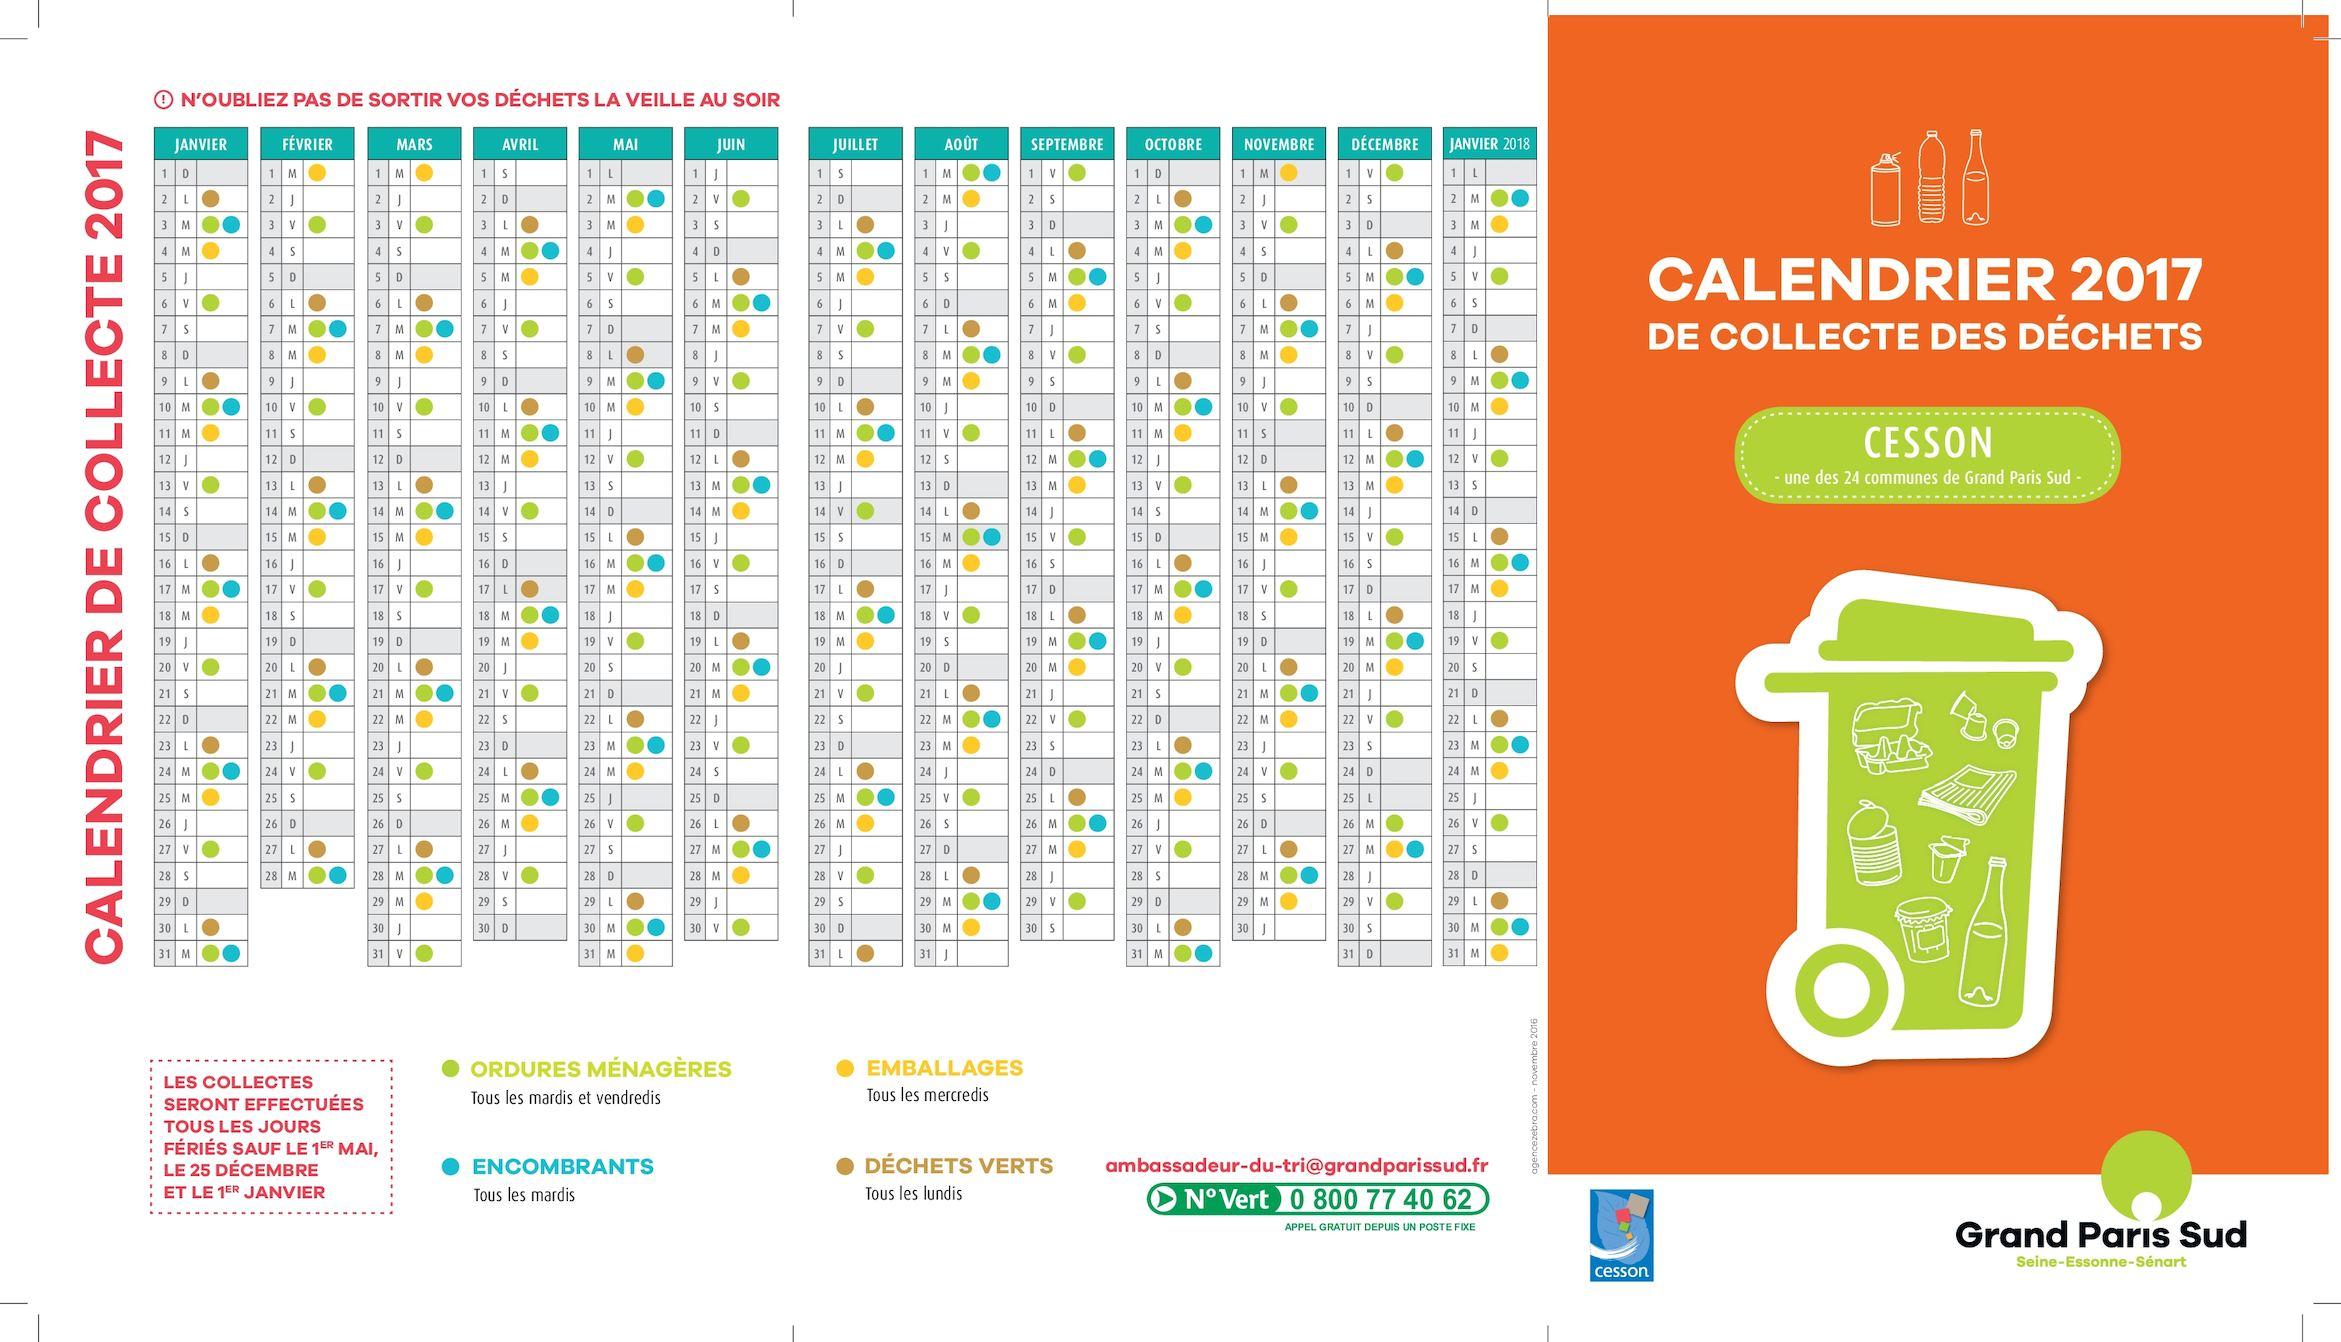 Calendrier Encombrants 77.Calameo Calendrier Collecte Dechets Cesson